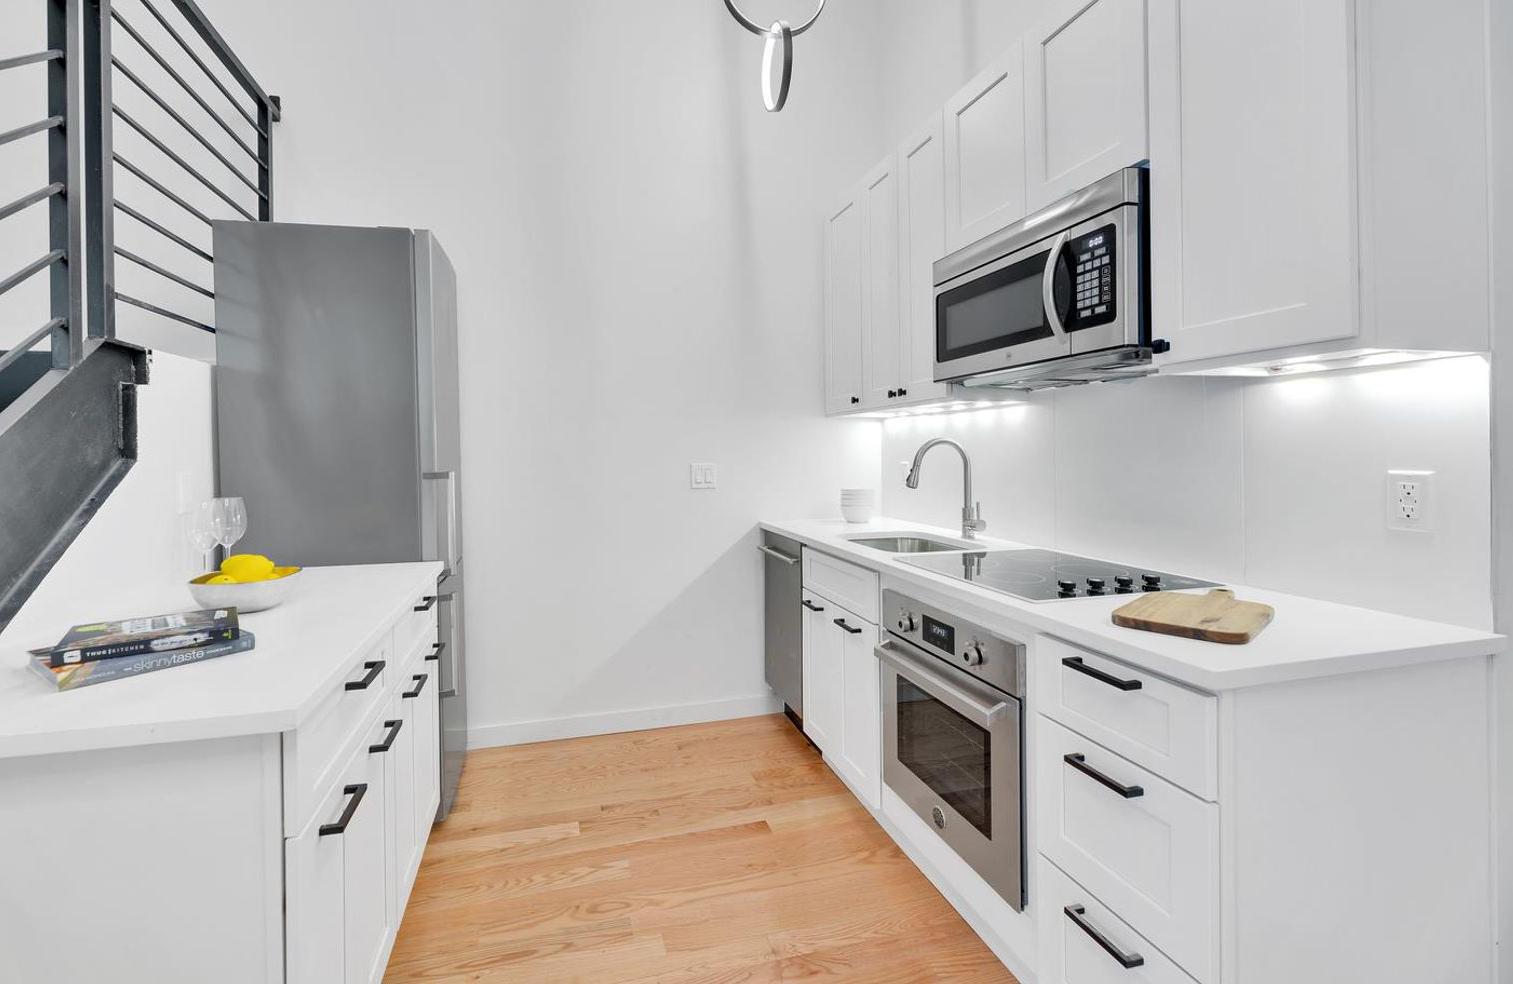 Be.Live Harlem Condominiums, 2903 Frederick Douglass Boulevard